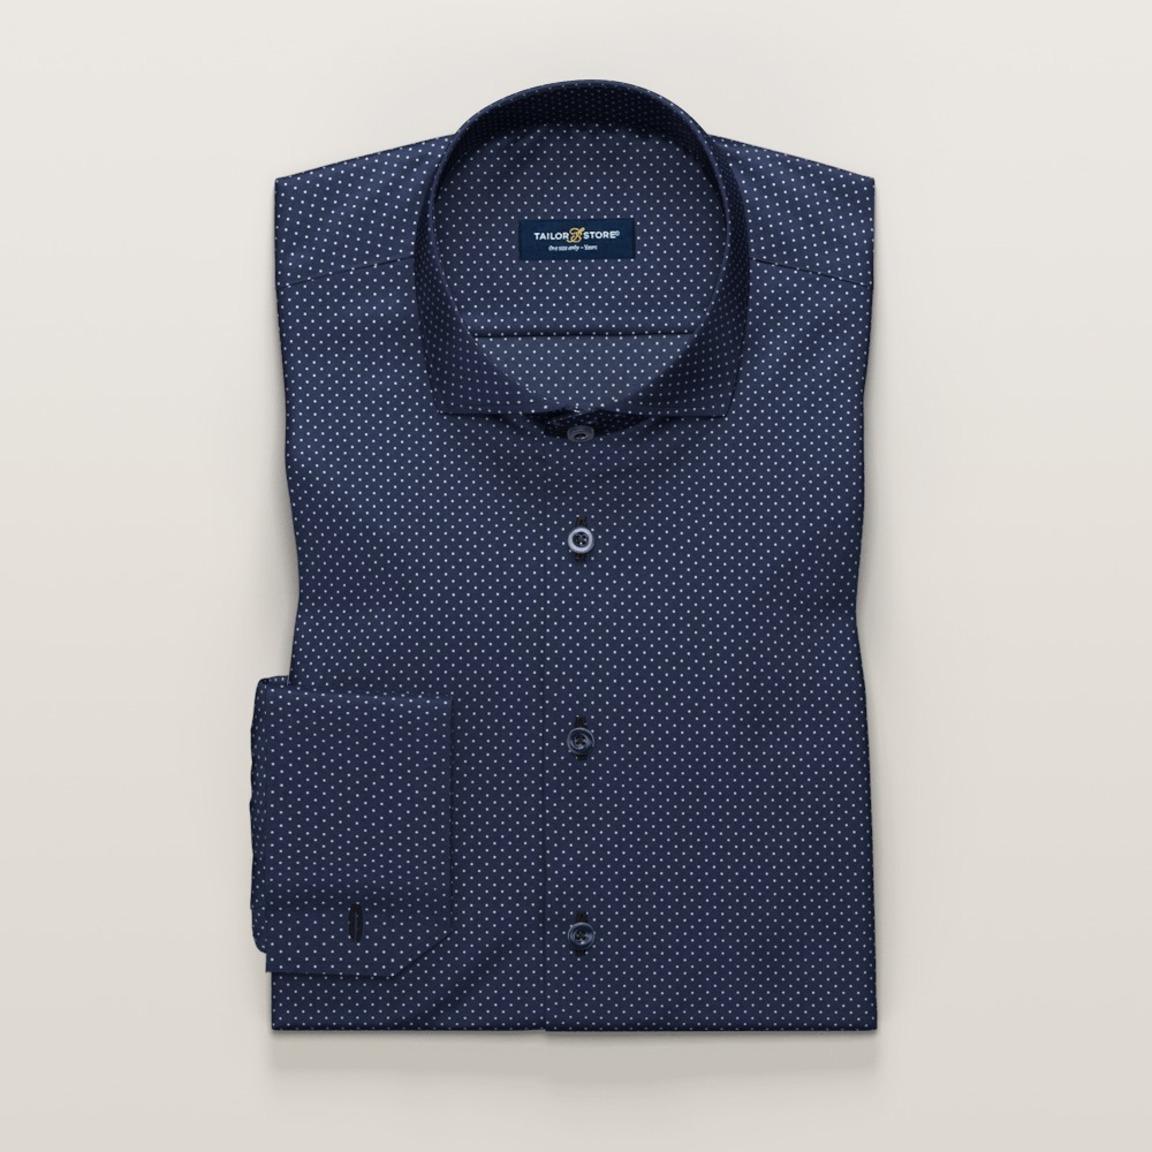 Navy dress shirt with dots